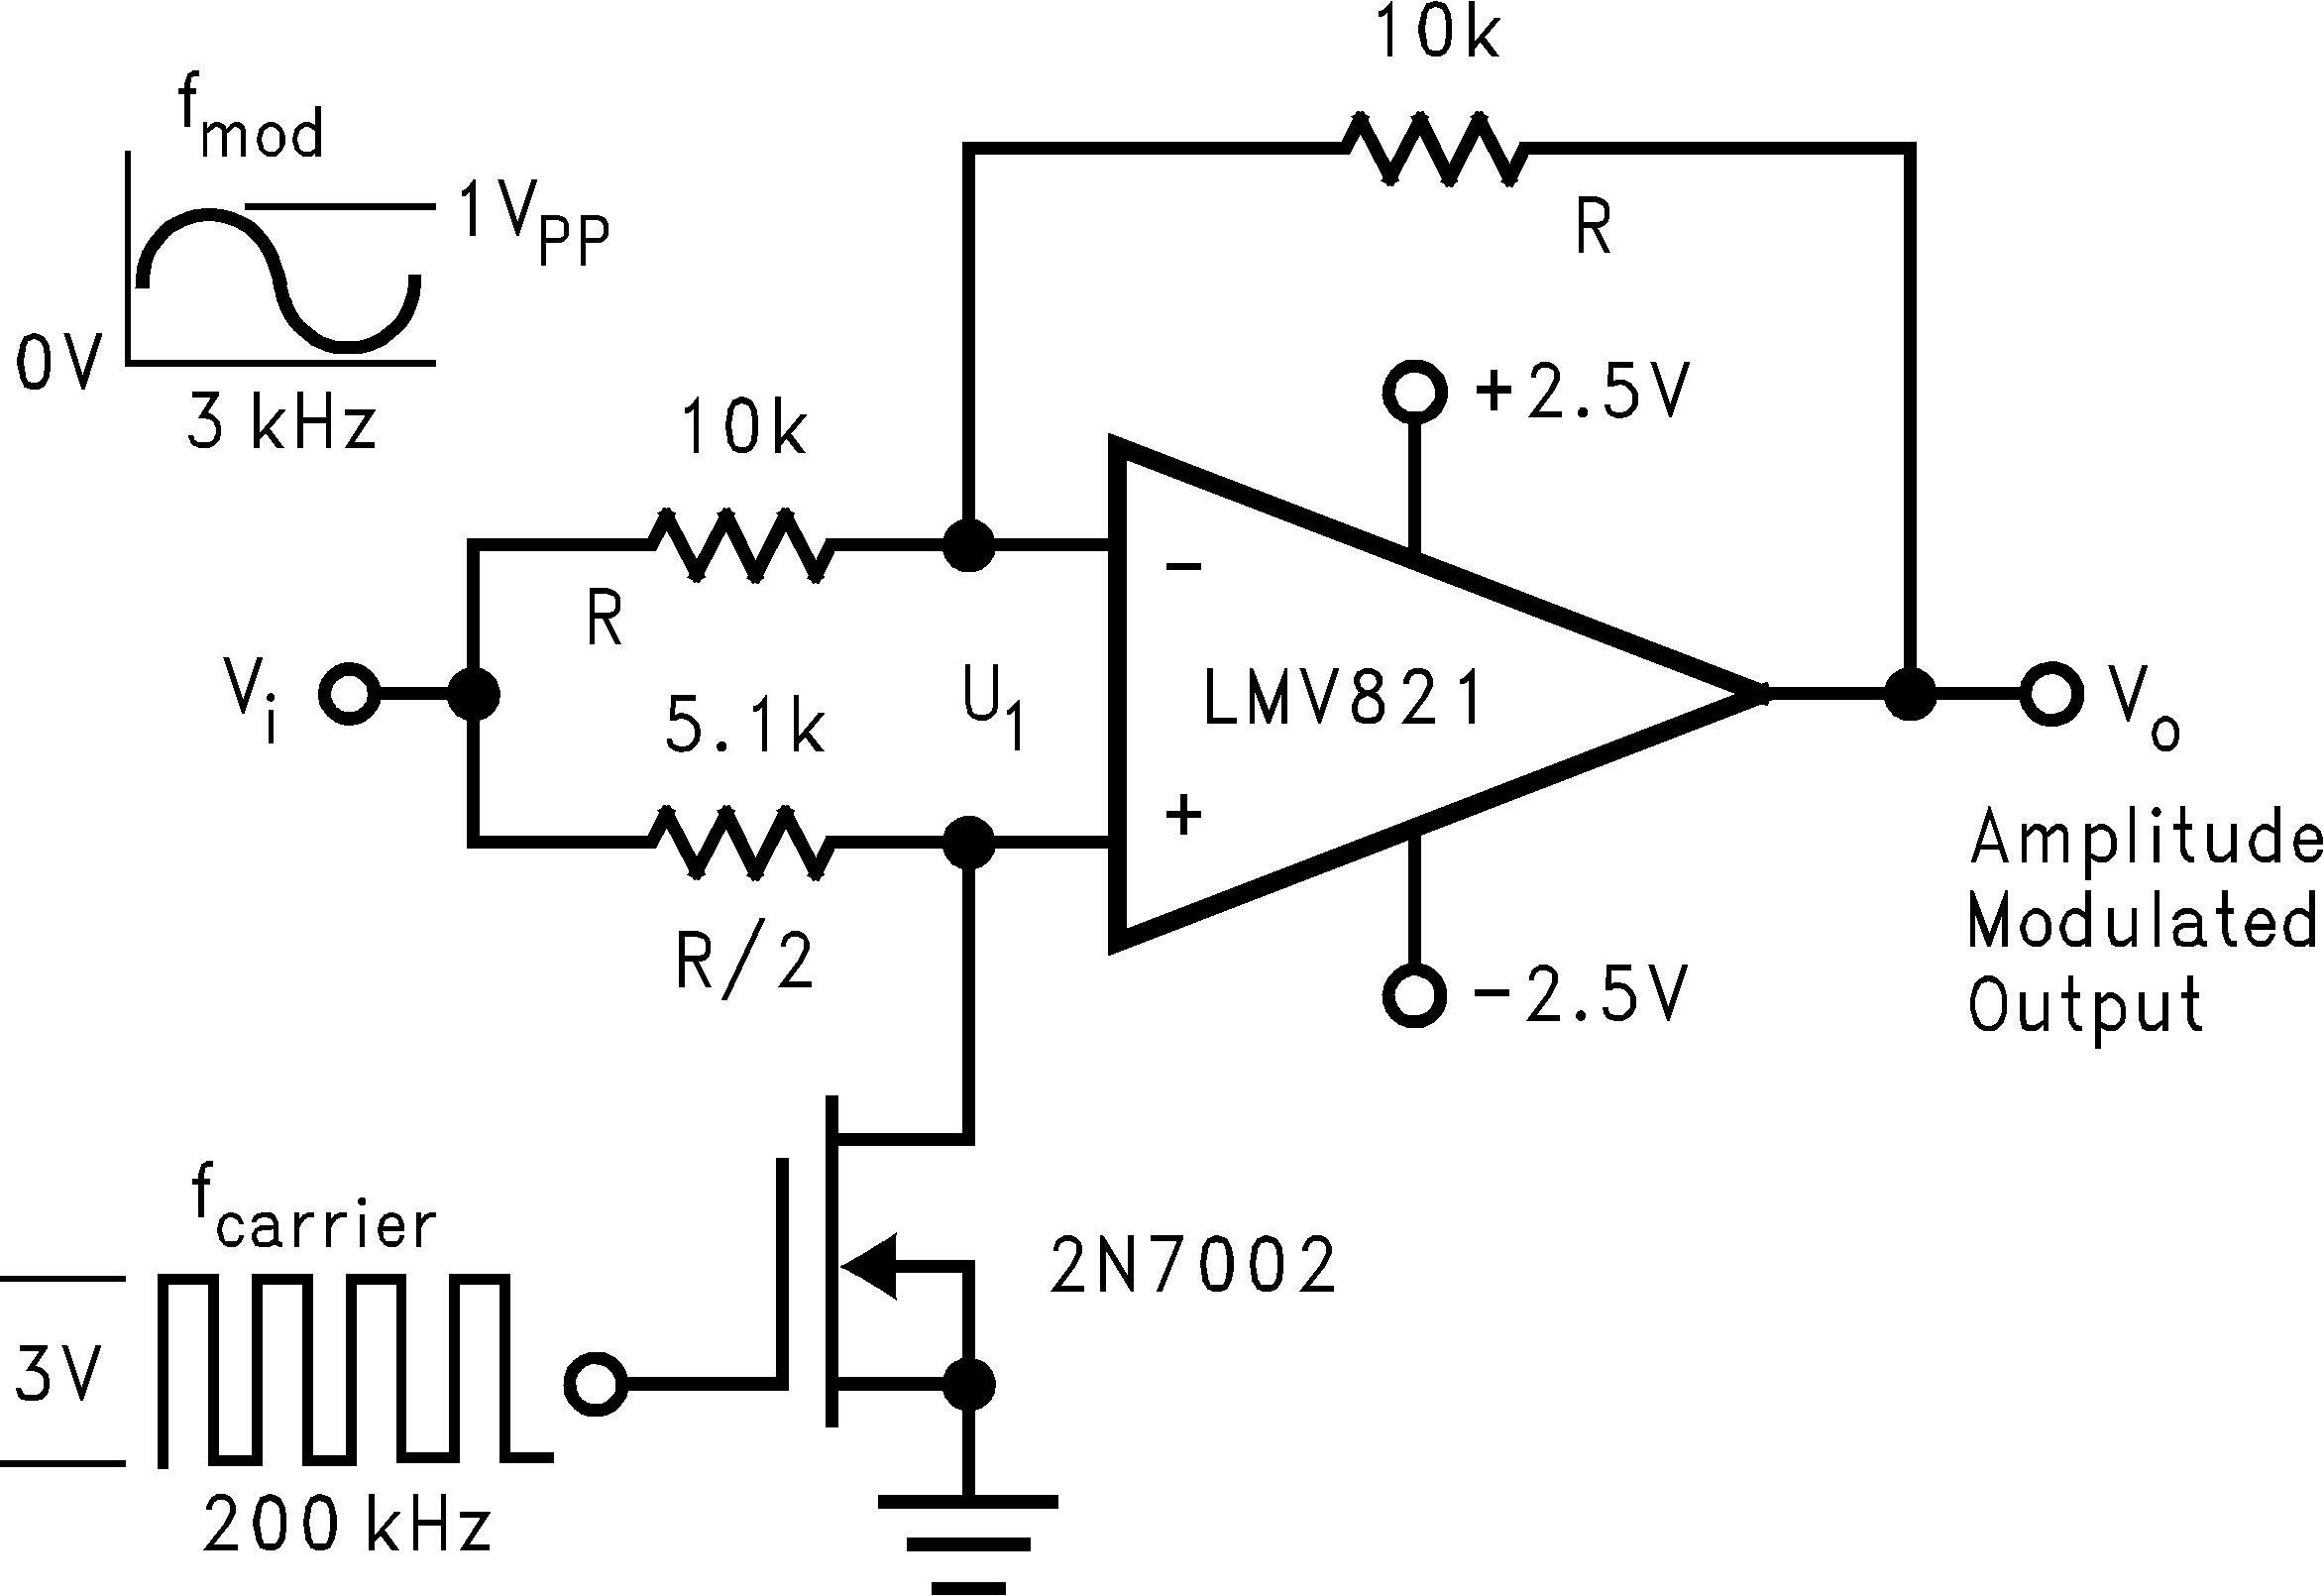 Lmv824 n q1 tij 822 simple mixer amplitude modulator publicscrutiny Gallery